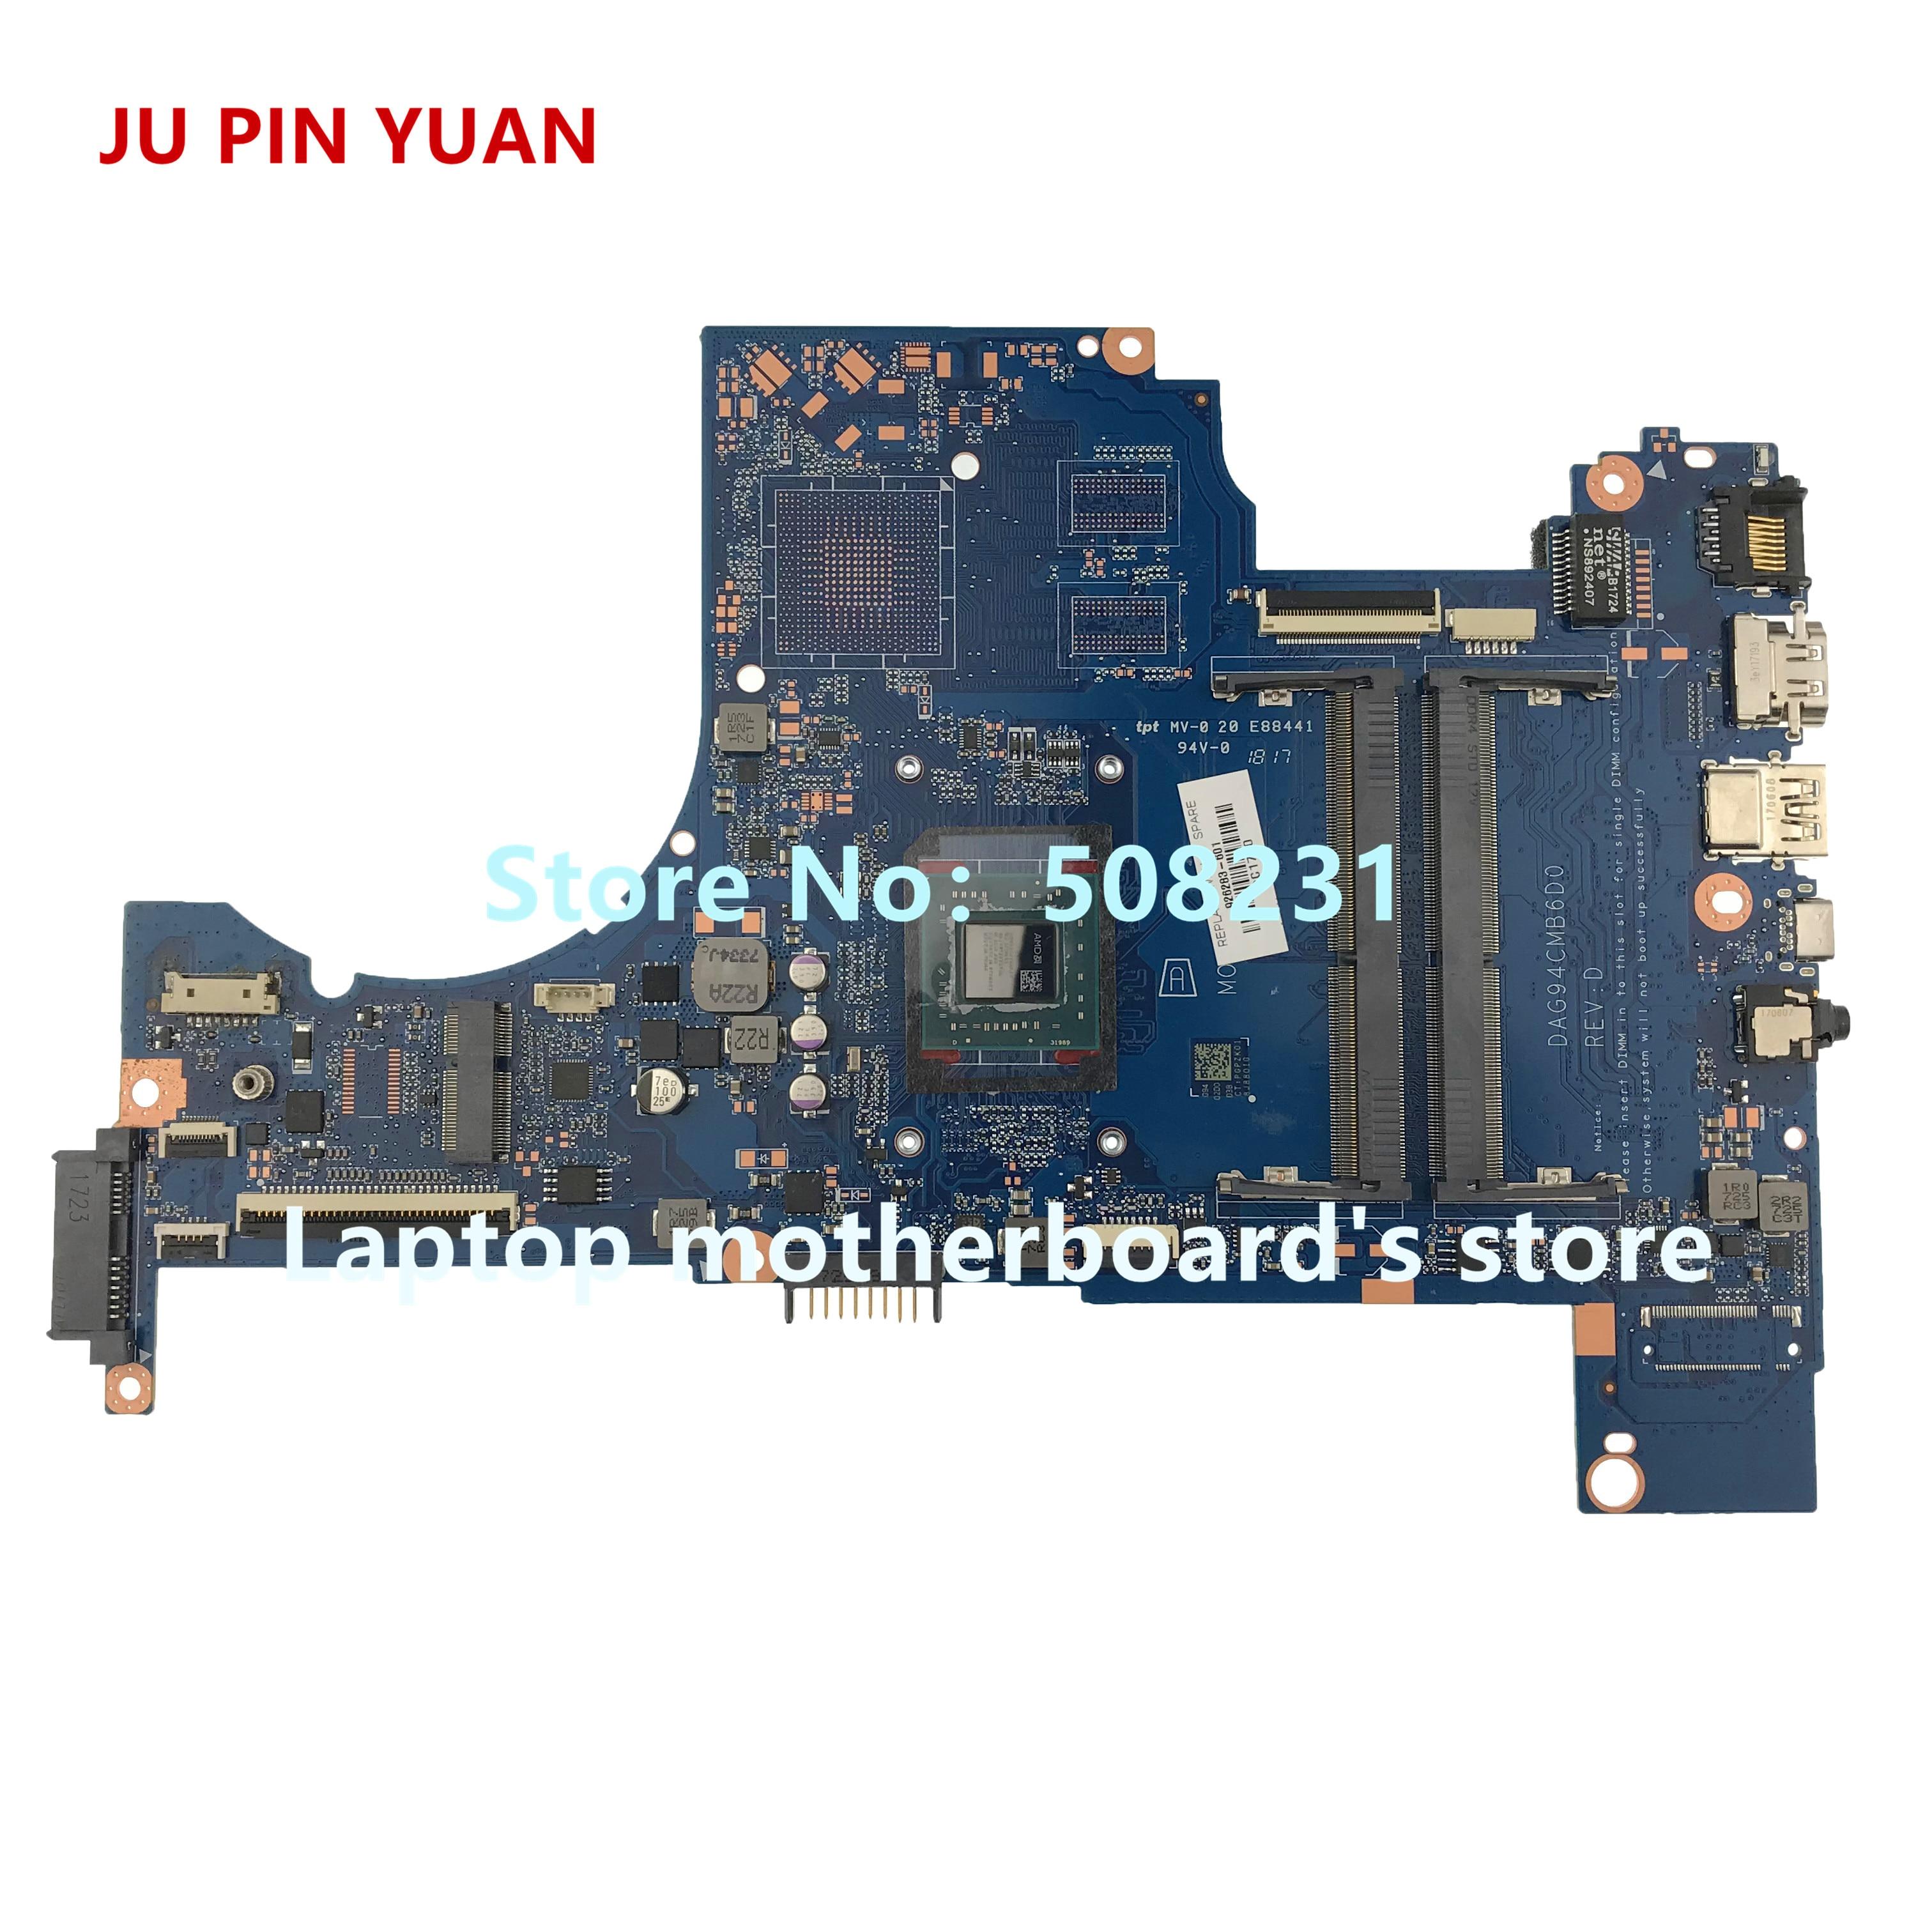 Ju pin Yuan 926283-601 DAG94CMB6D0 placa madre para HP PAVILION 15-CD 15Z-CD placa base de computadora portátil A9-9420